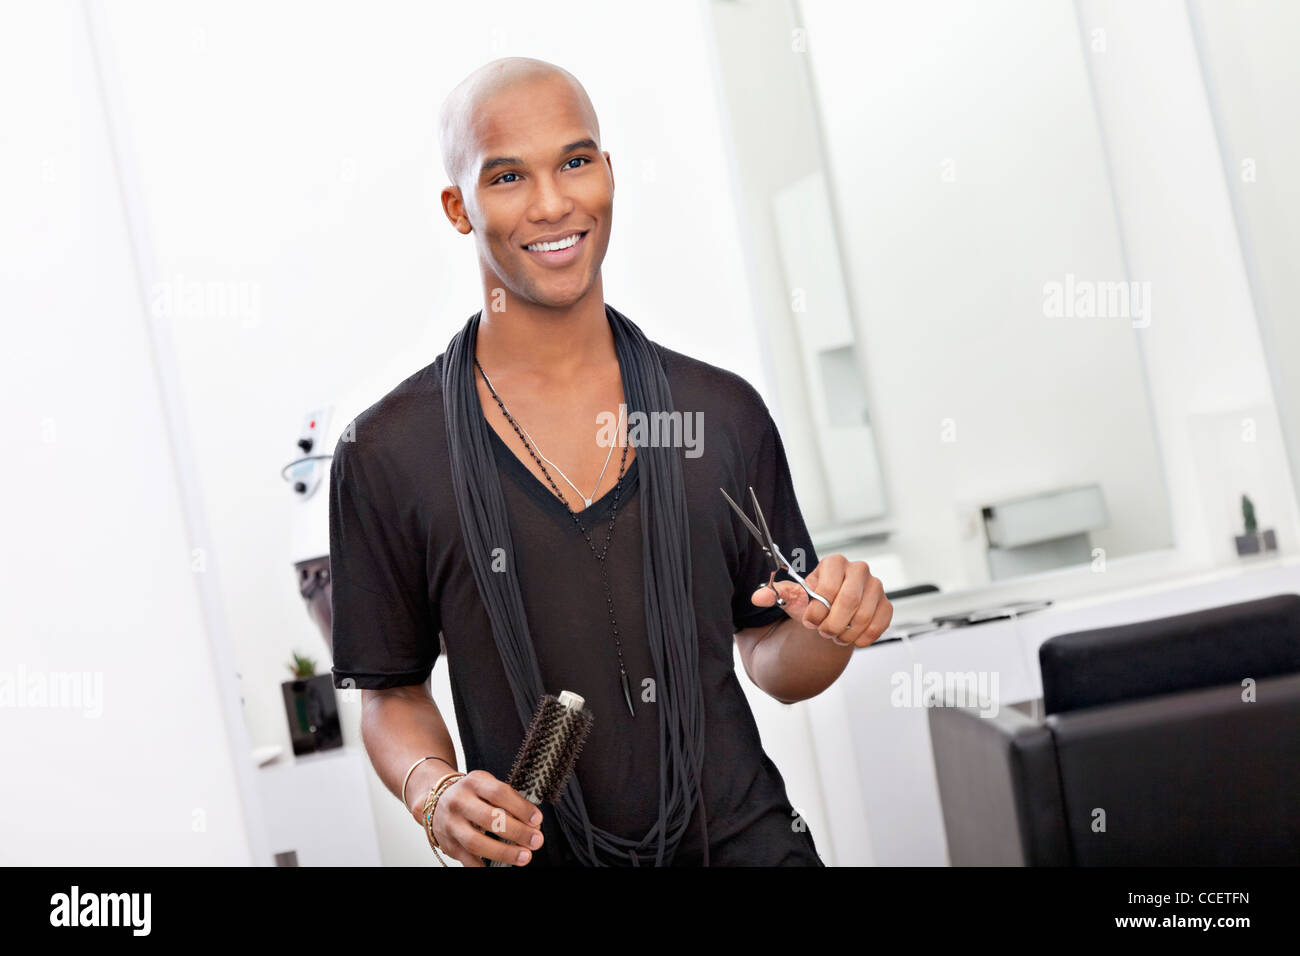 Smiling male hairdresser holding scissor and hairbrush - Stock Image